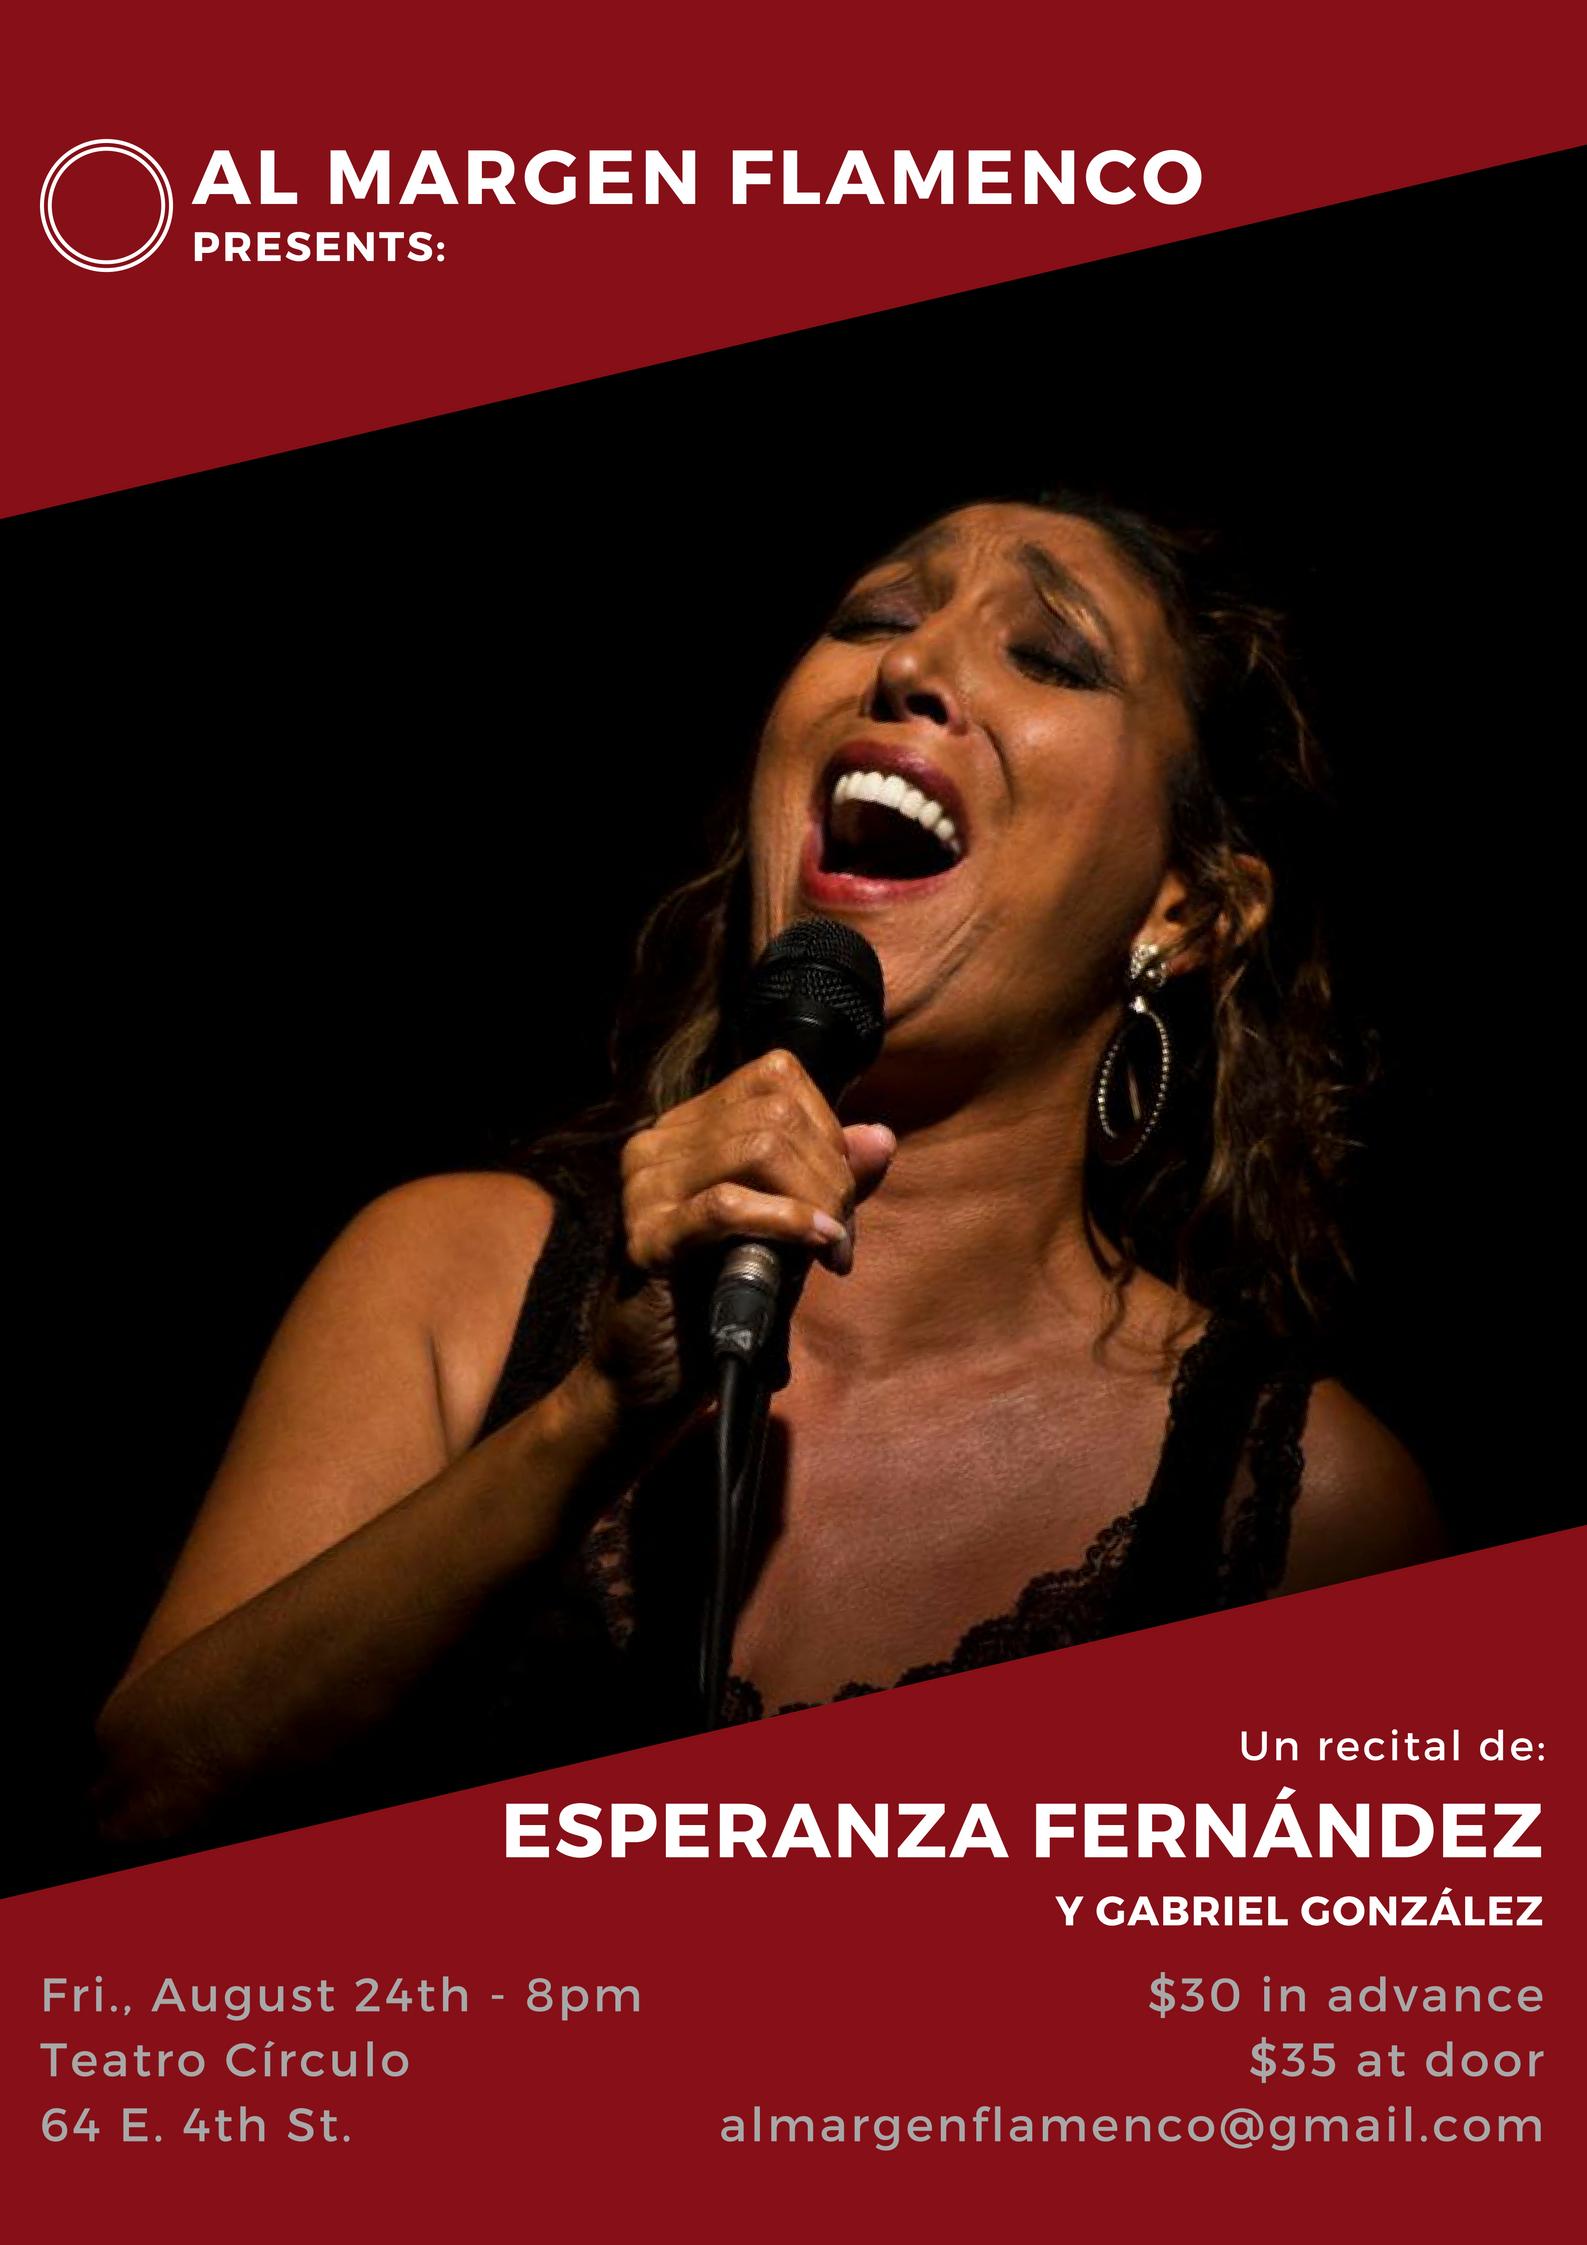 Esperanza Fernandez Recital Poster - 8-24-18.jpg